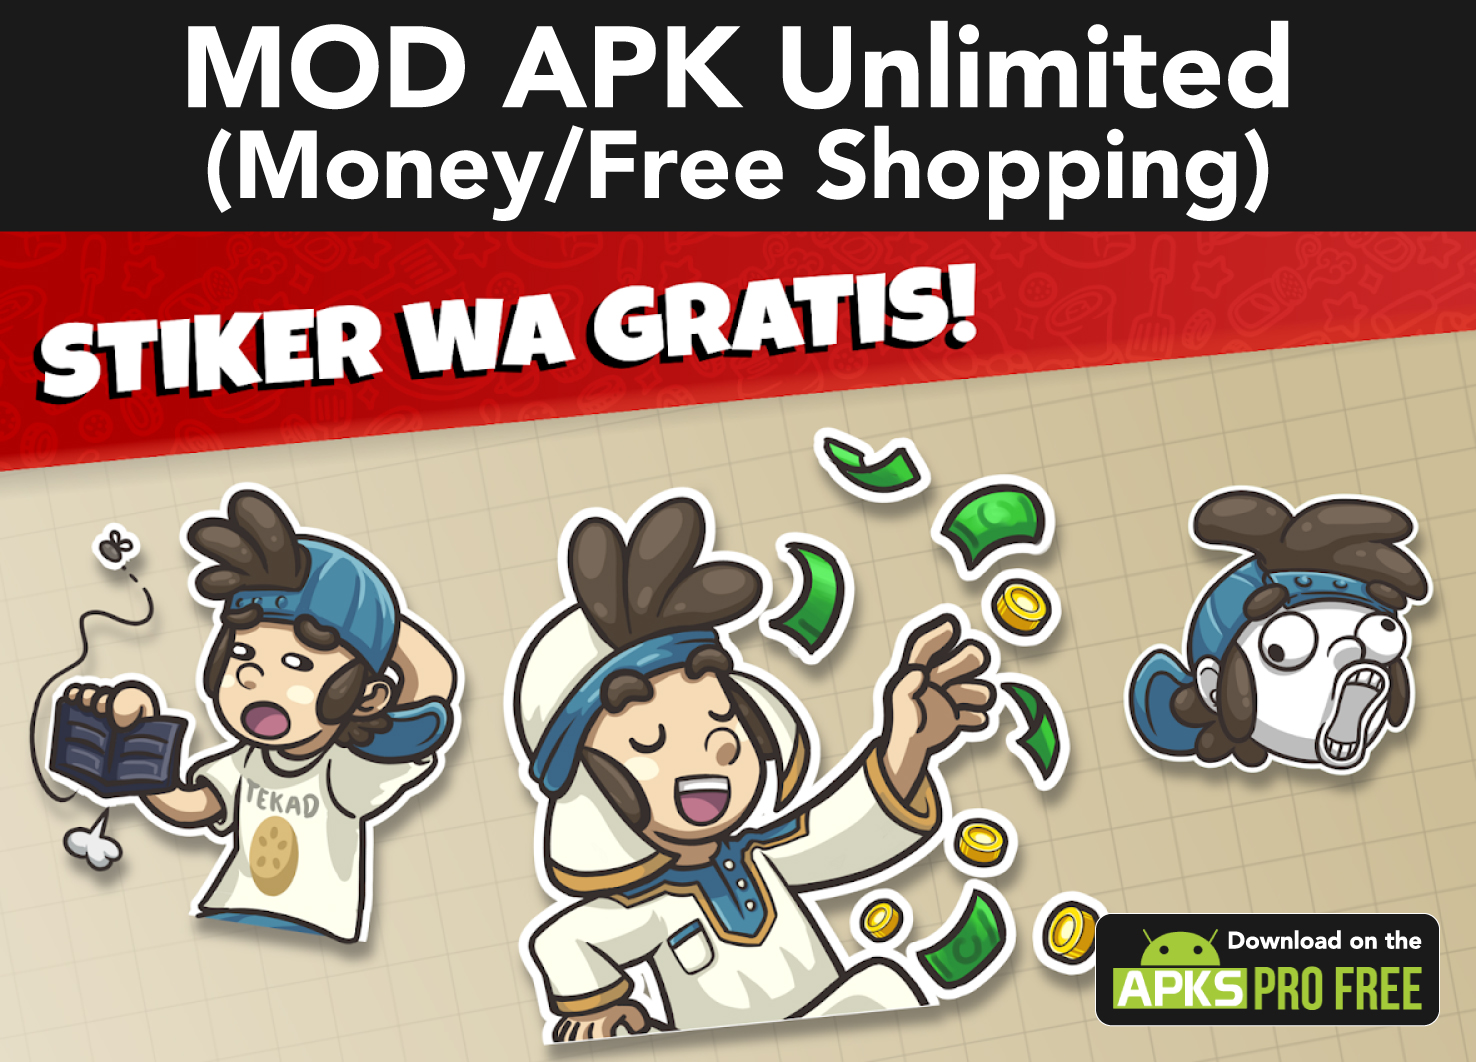 Tahu Bulat mod apk 15.2.6(Free Shopping/Unlimited Money) 100% Worked